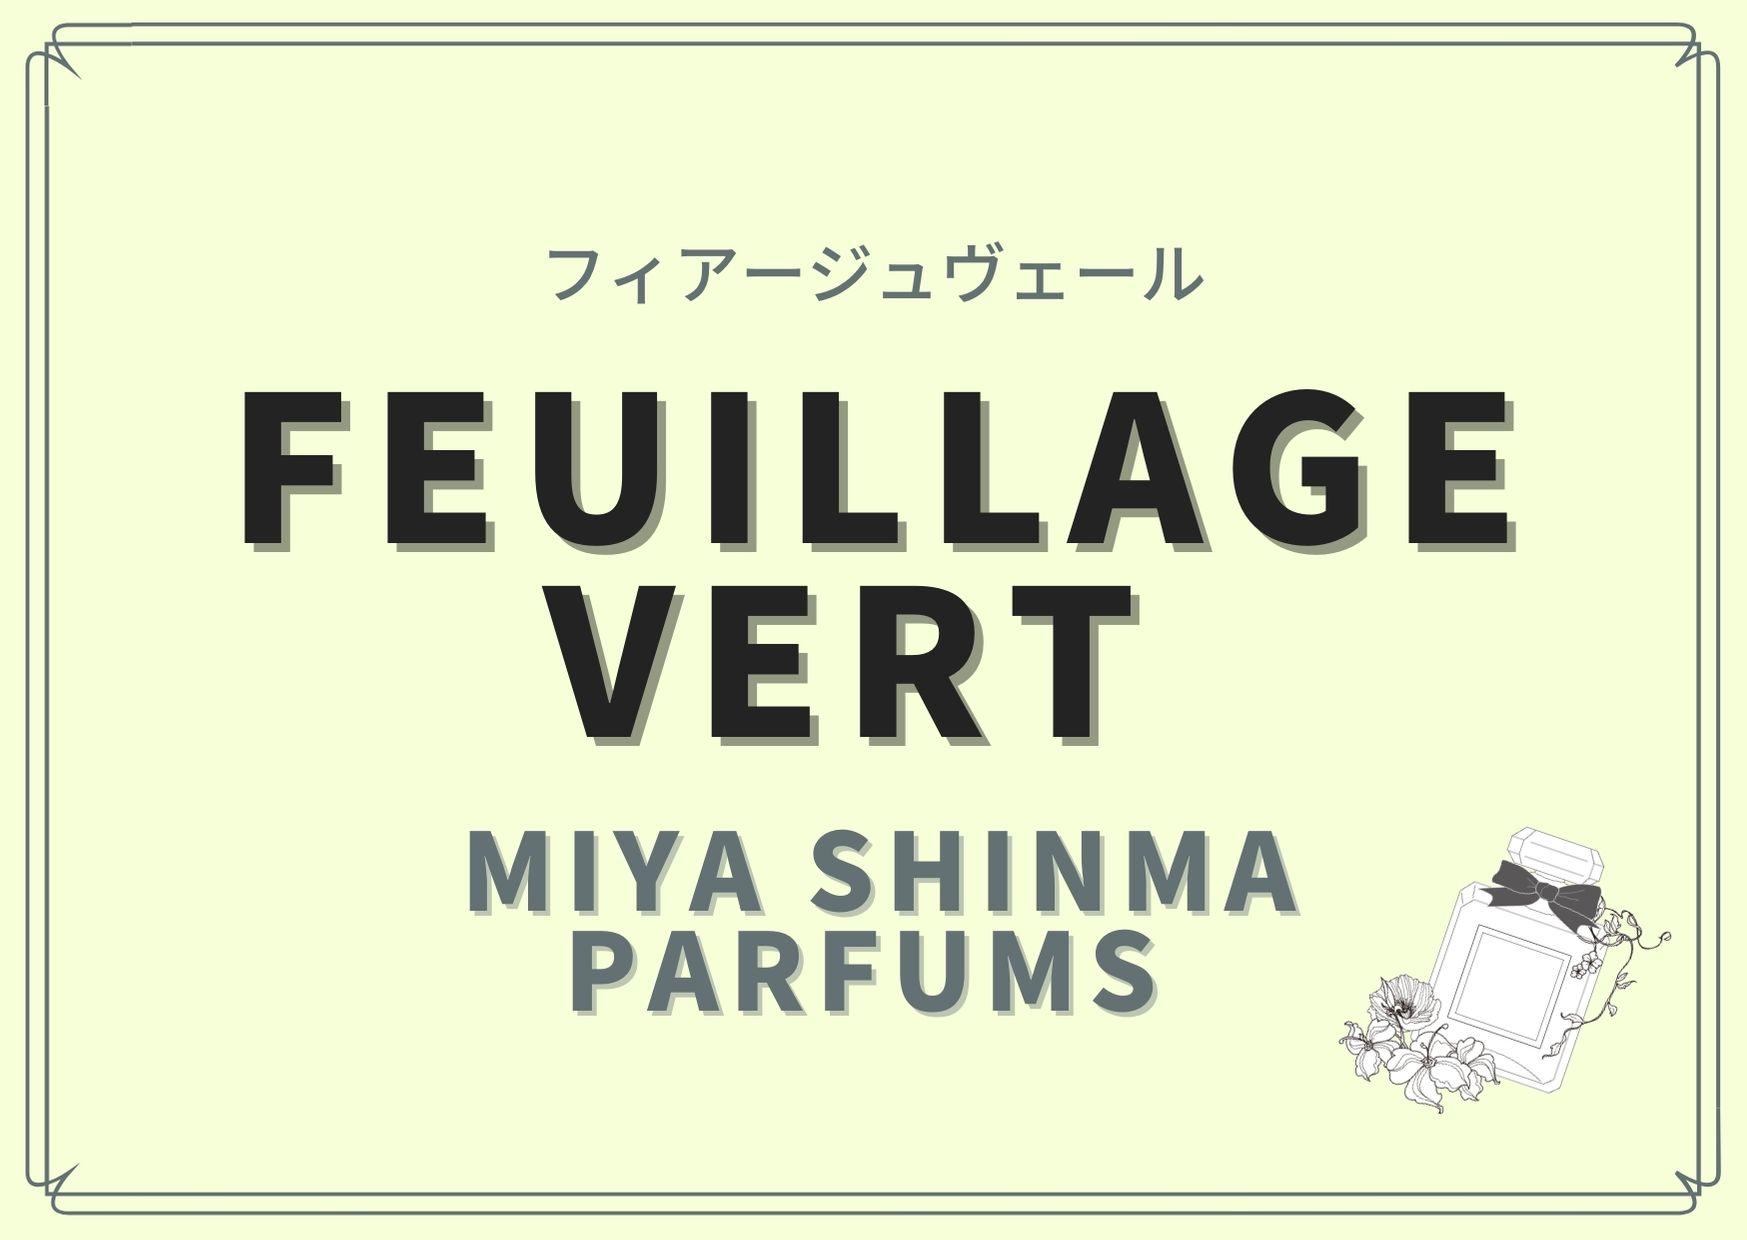 Feuillage vert (フィアージュヴェール)/Miya Shinma parfums (ミヤ シンマ パルファン)